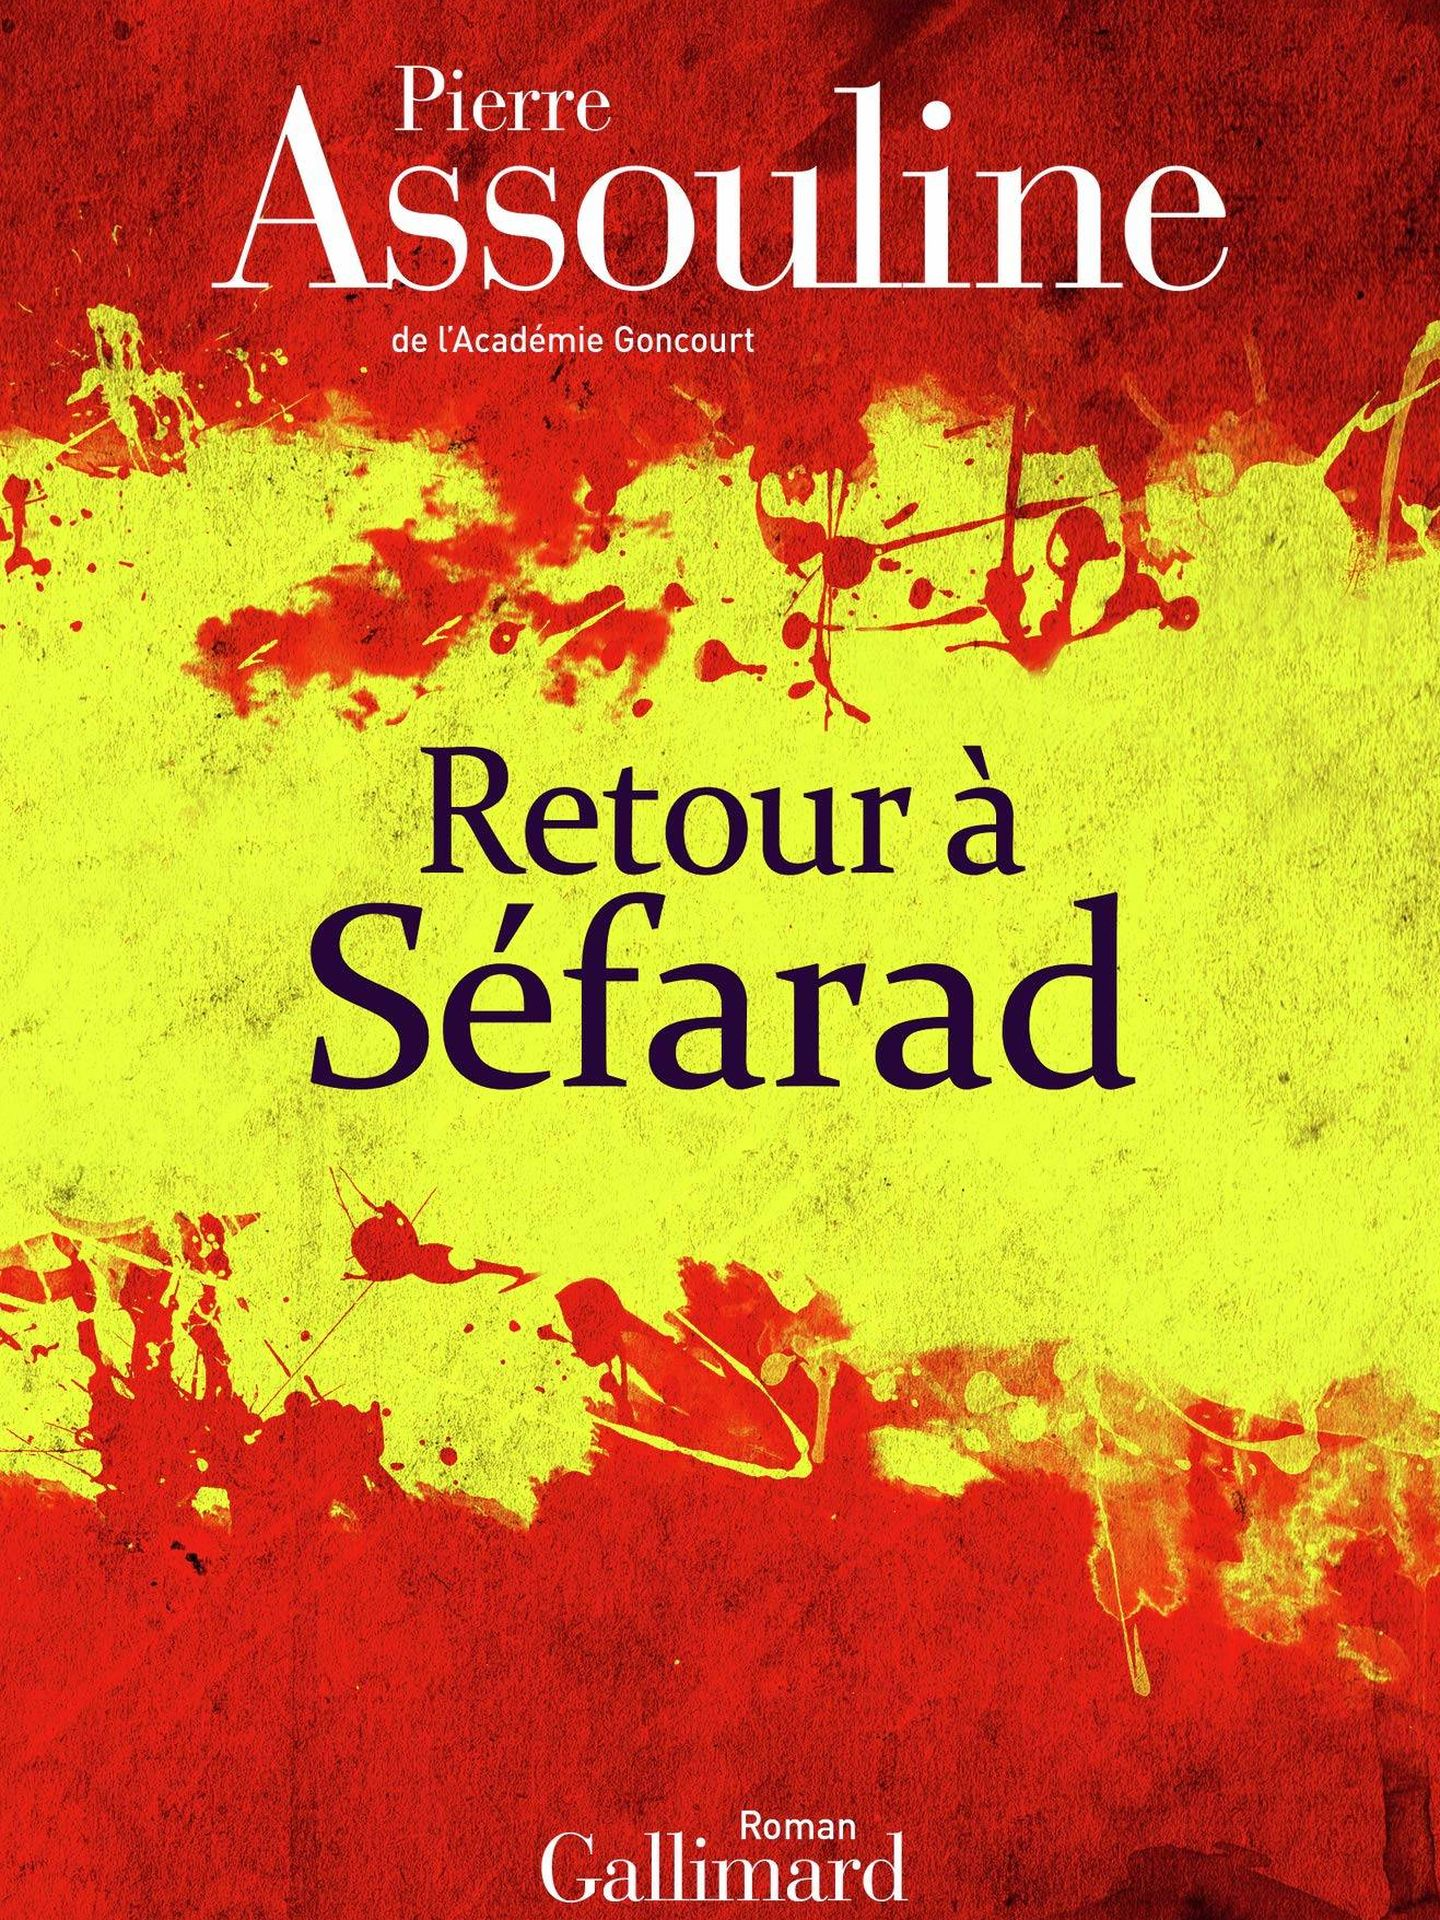 'Retour à Sefarad'. (Gallimard)